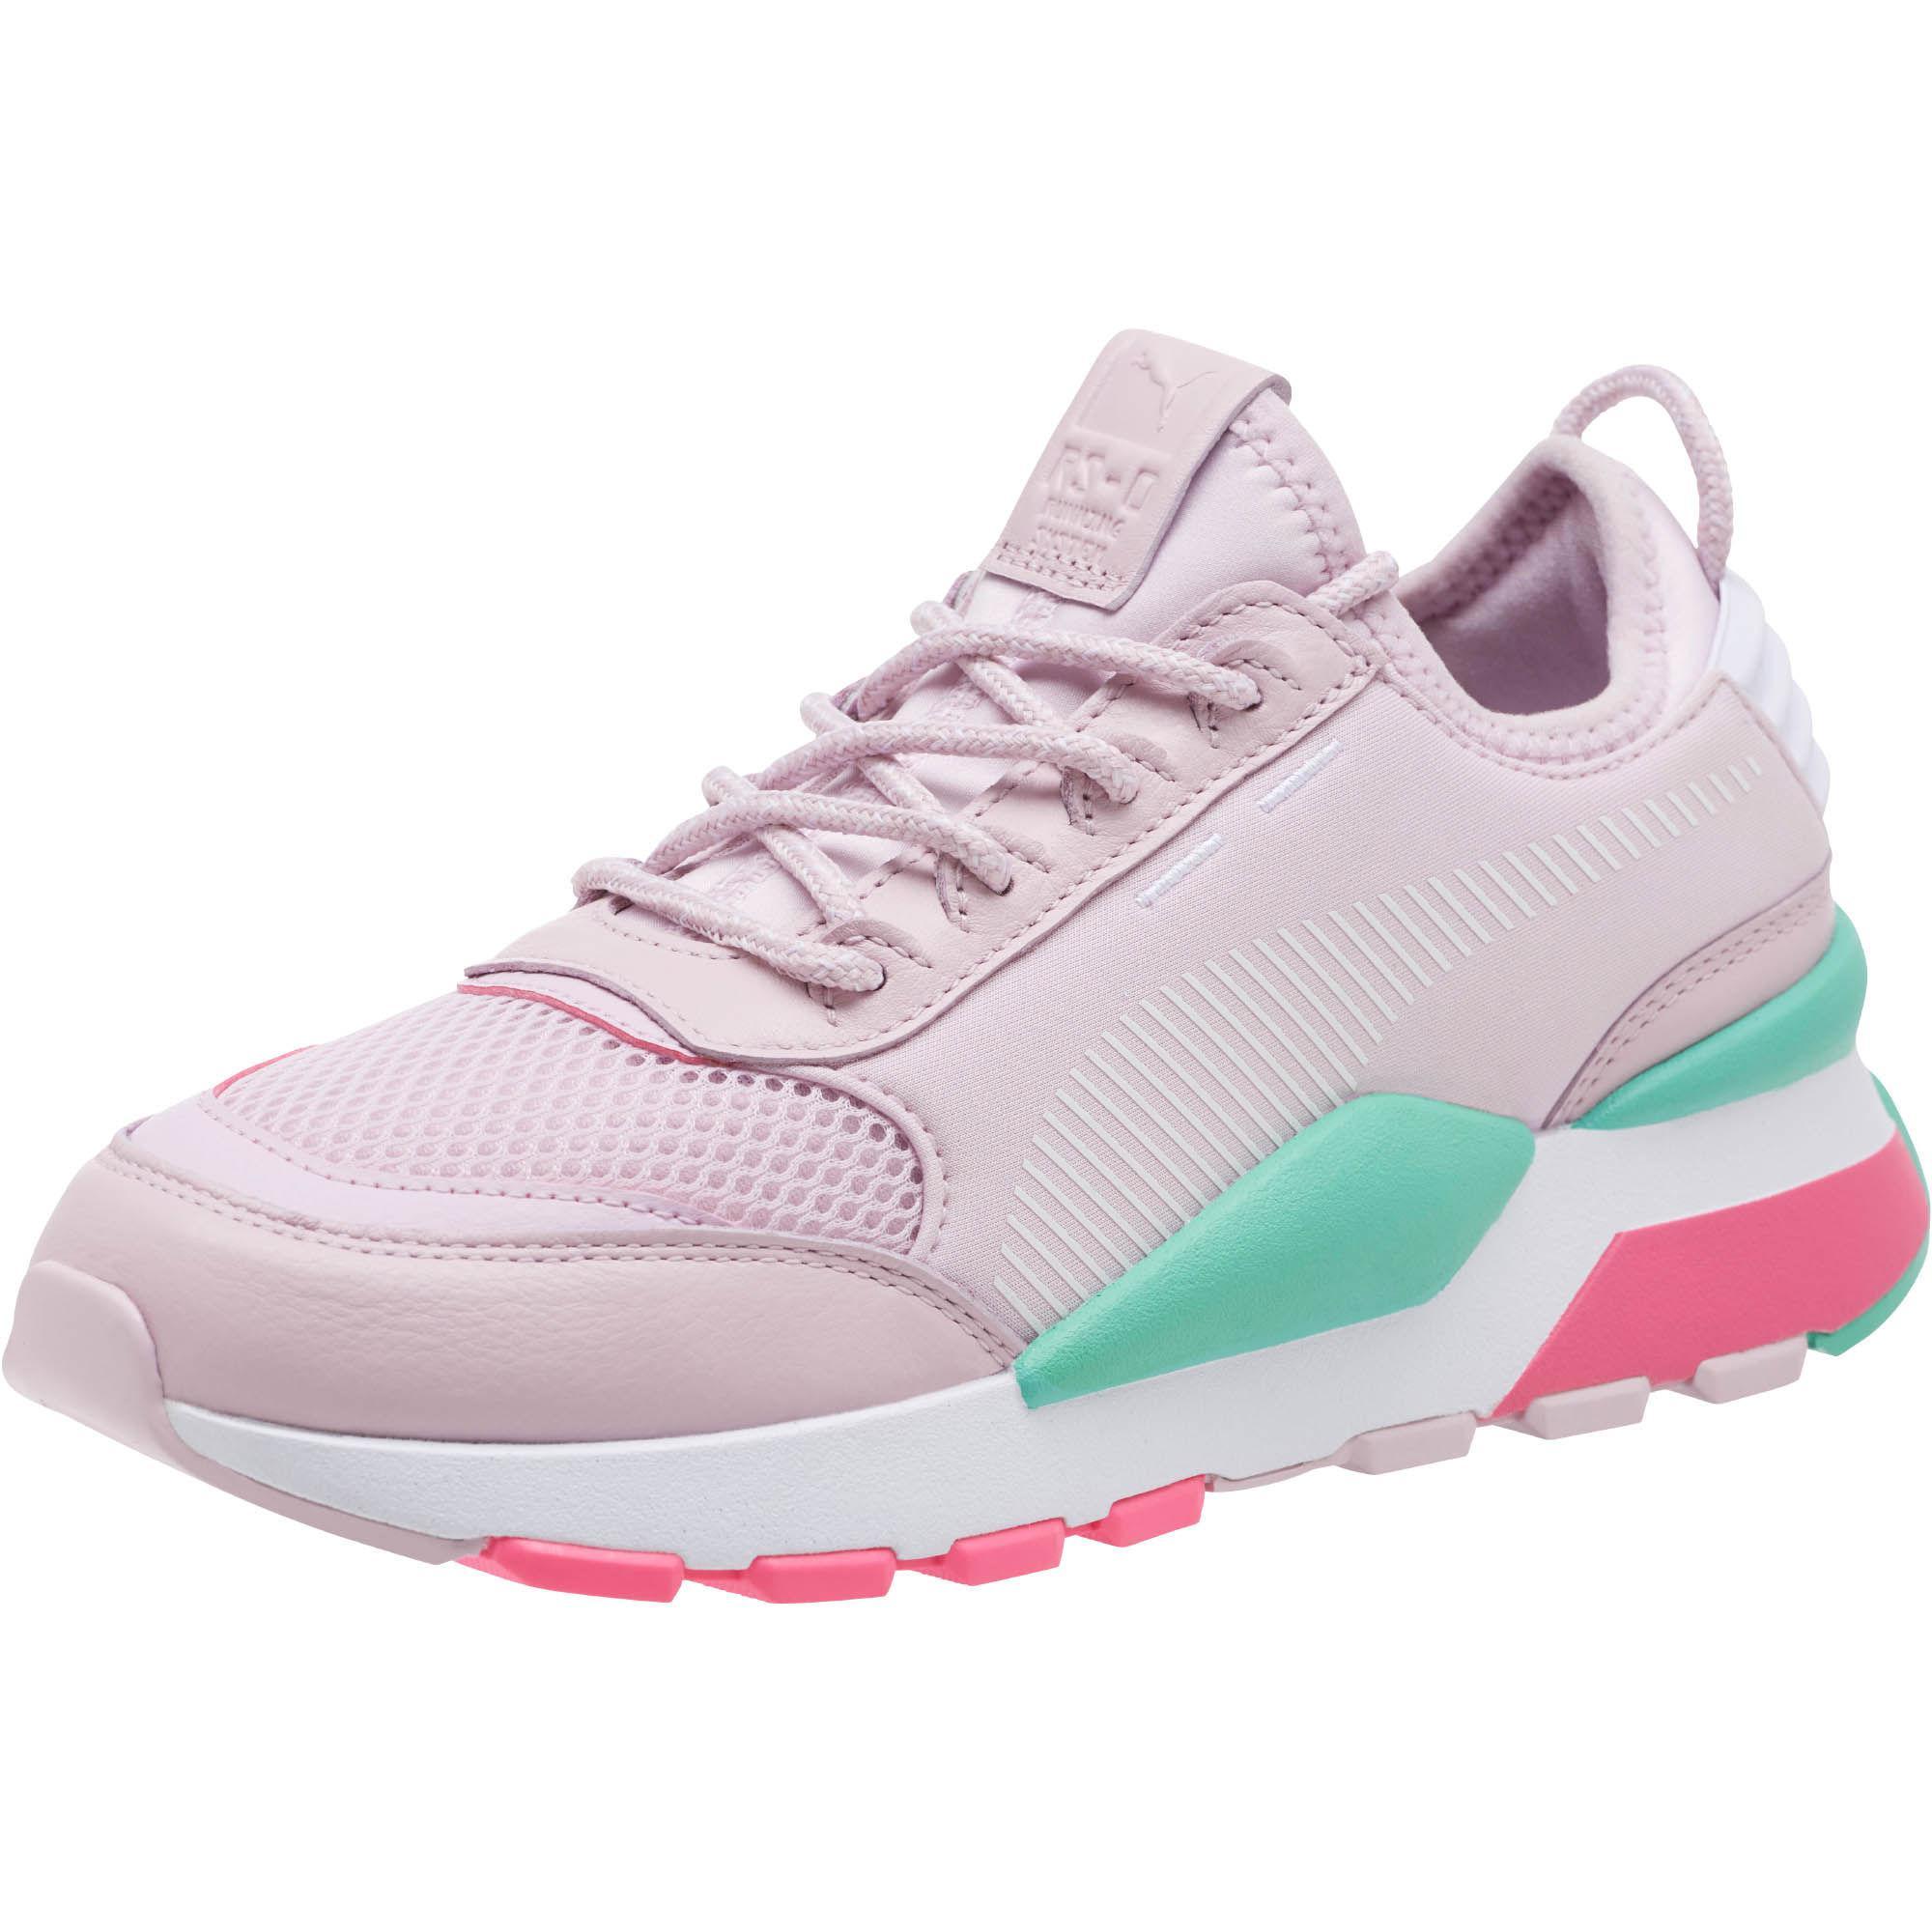 Lyst - PUMA Rs-0 Play Women s Sneakers 7c13ba901